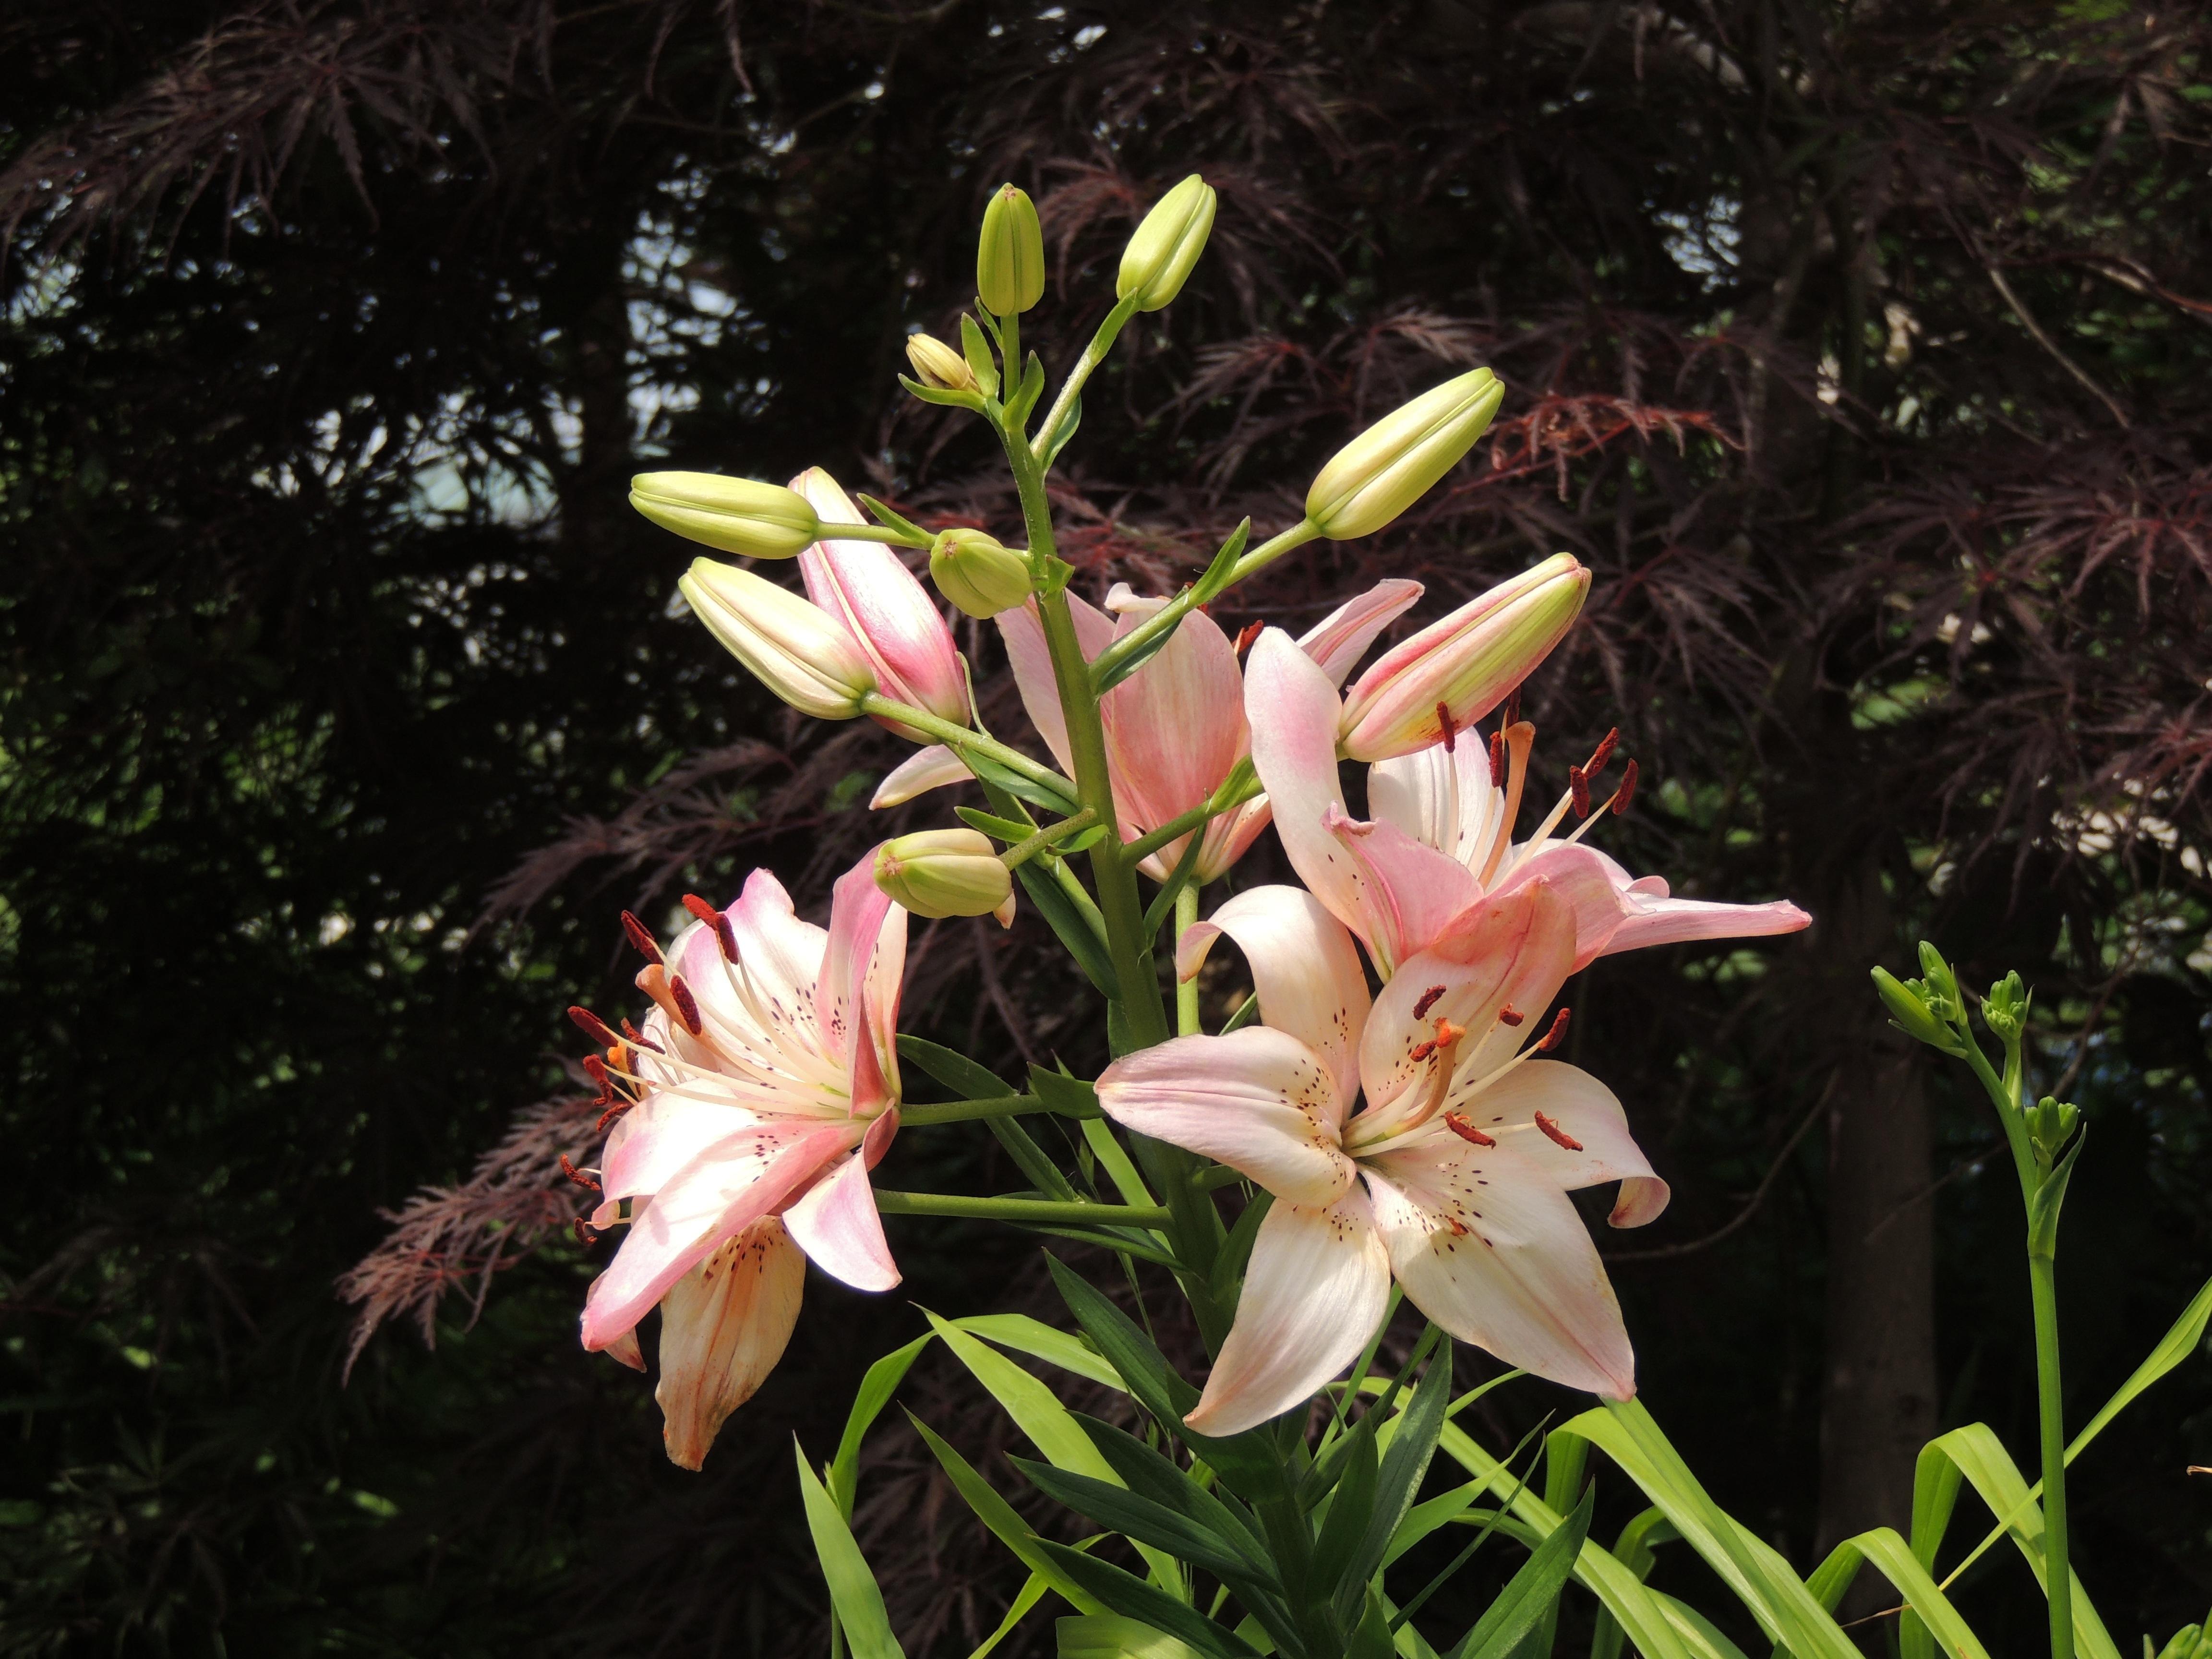 images gratuites la nature fleur t printemps botanique jardin flore v g tation. Black Bedroom Furniture Sets. Home Design Ideas